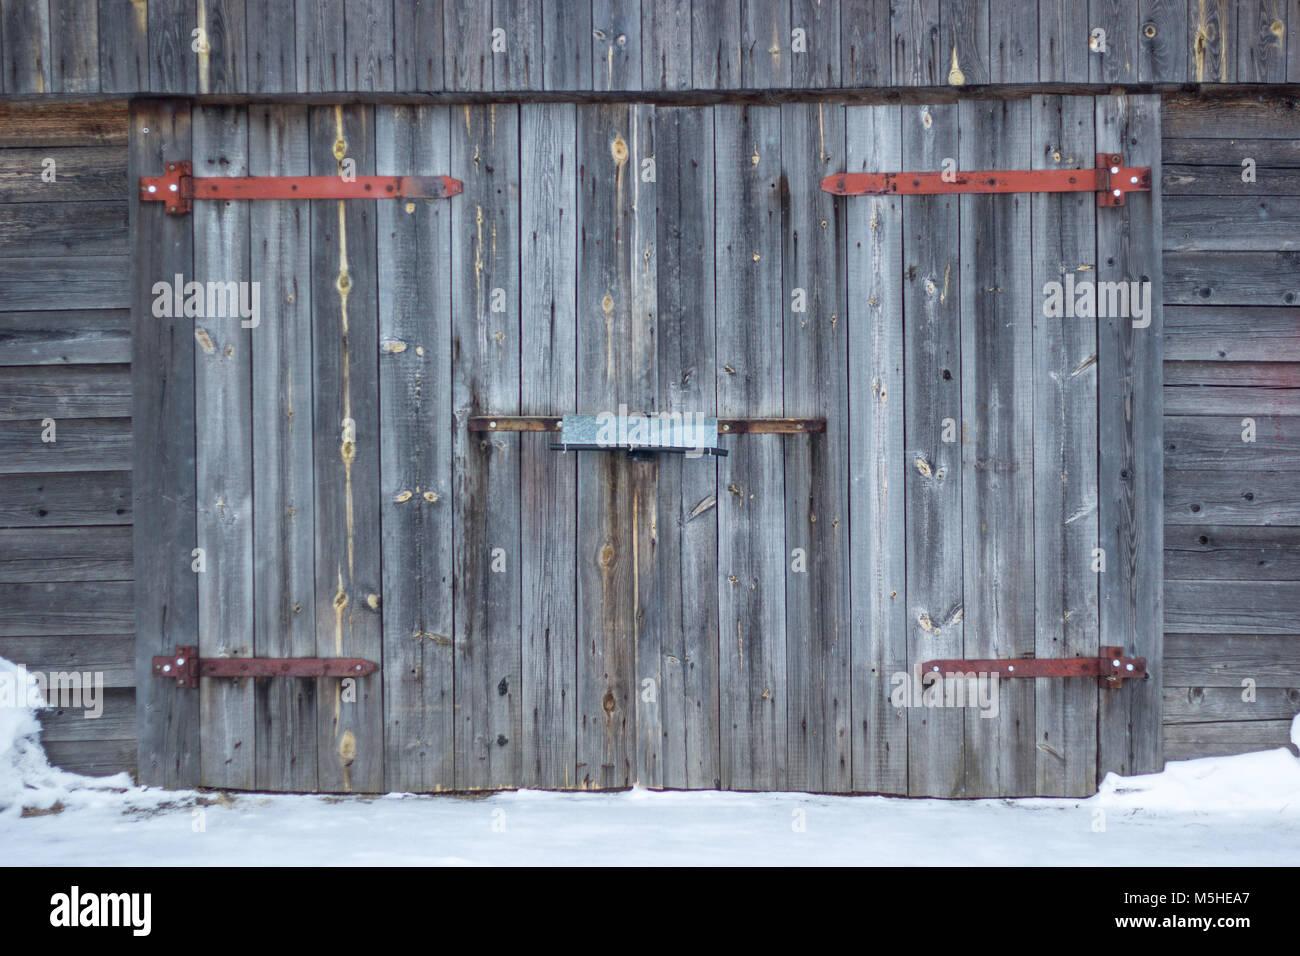 Garage Facade With Old Gray Wooden Gates. Old Garage Door   Stock Image